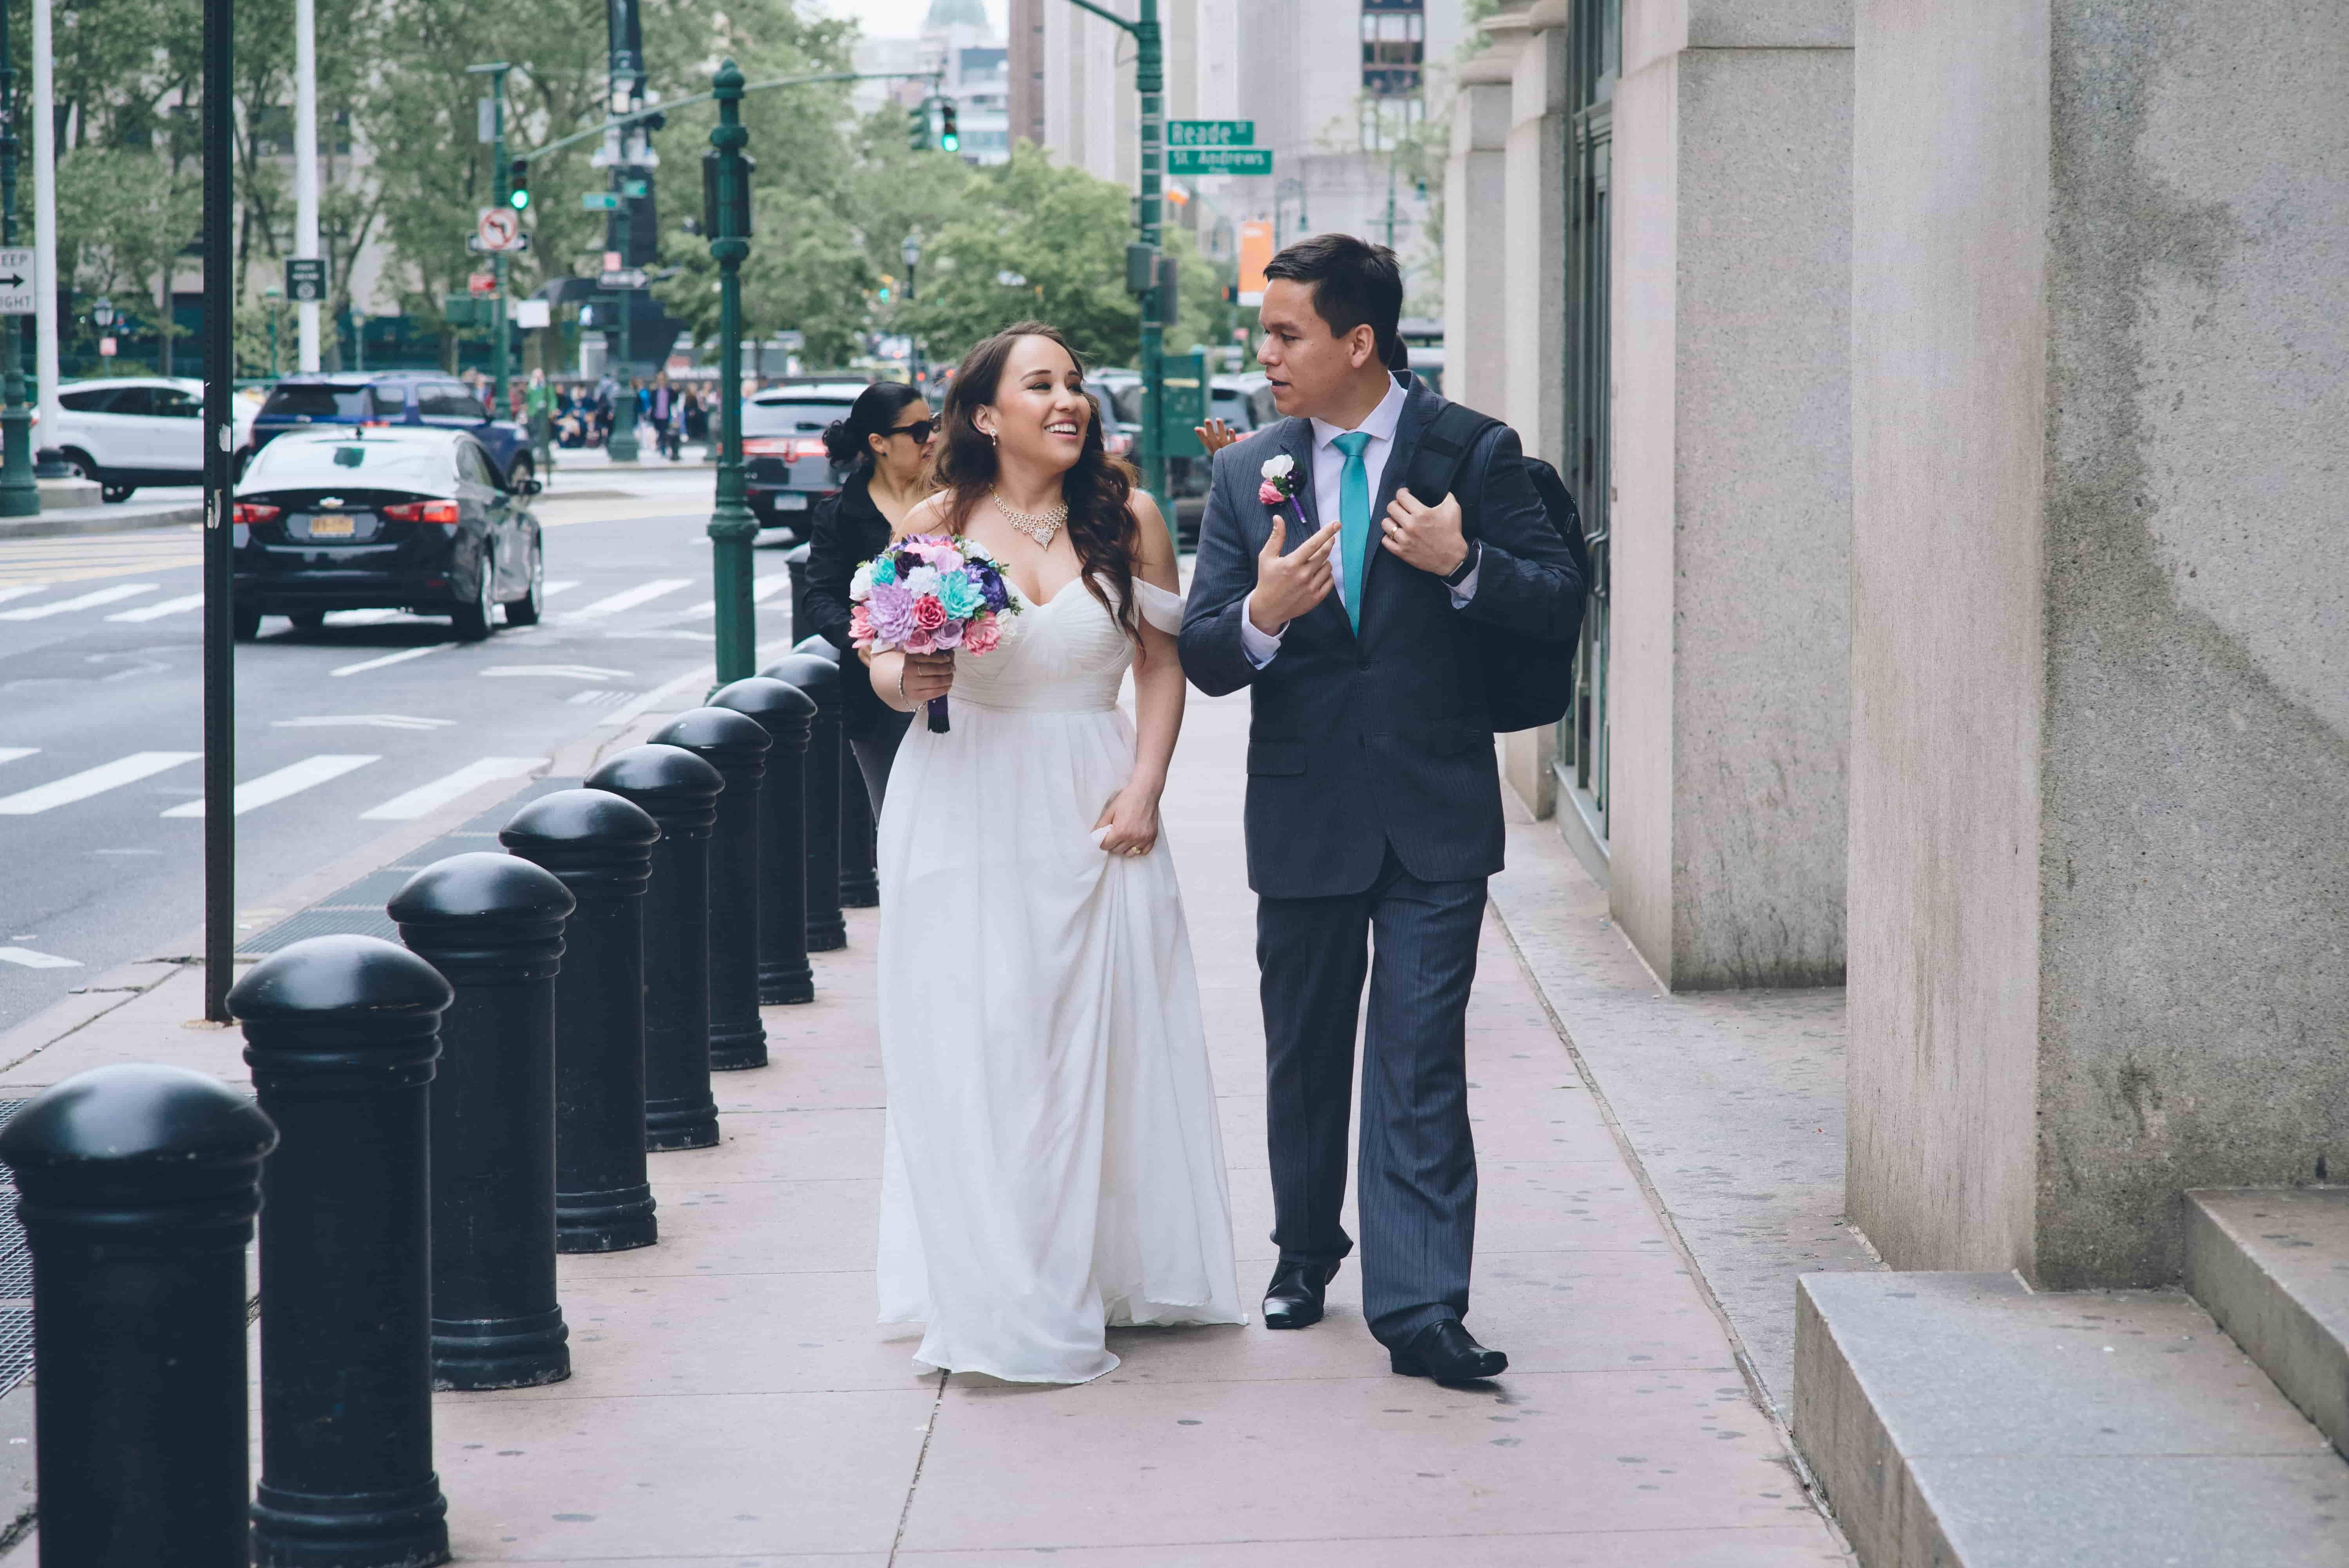 City Hall Wedding Photography Affordable 299